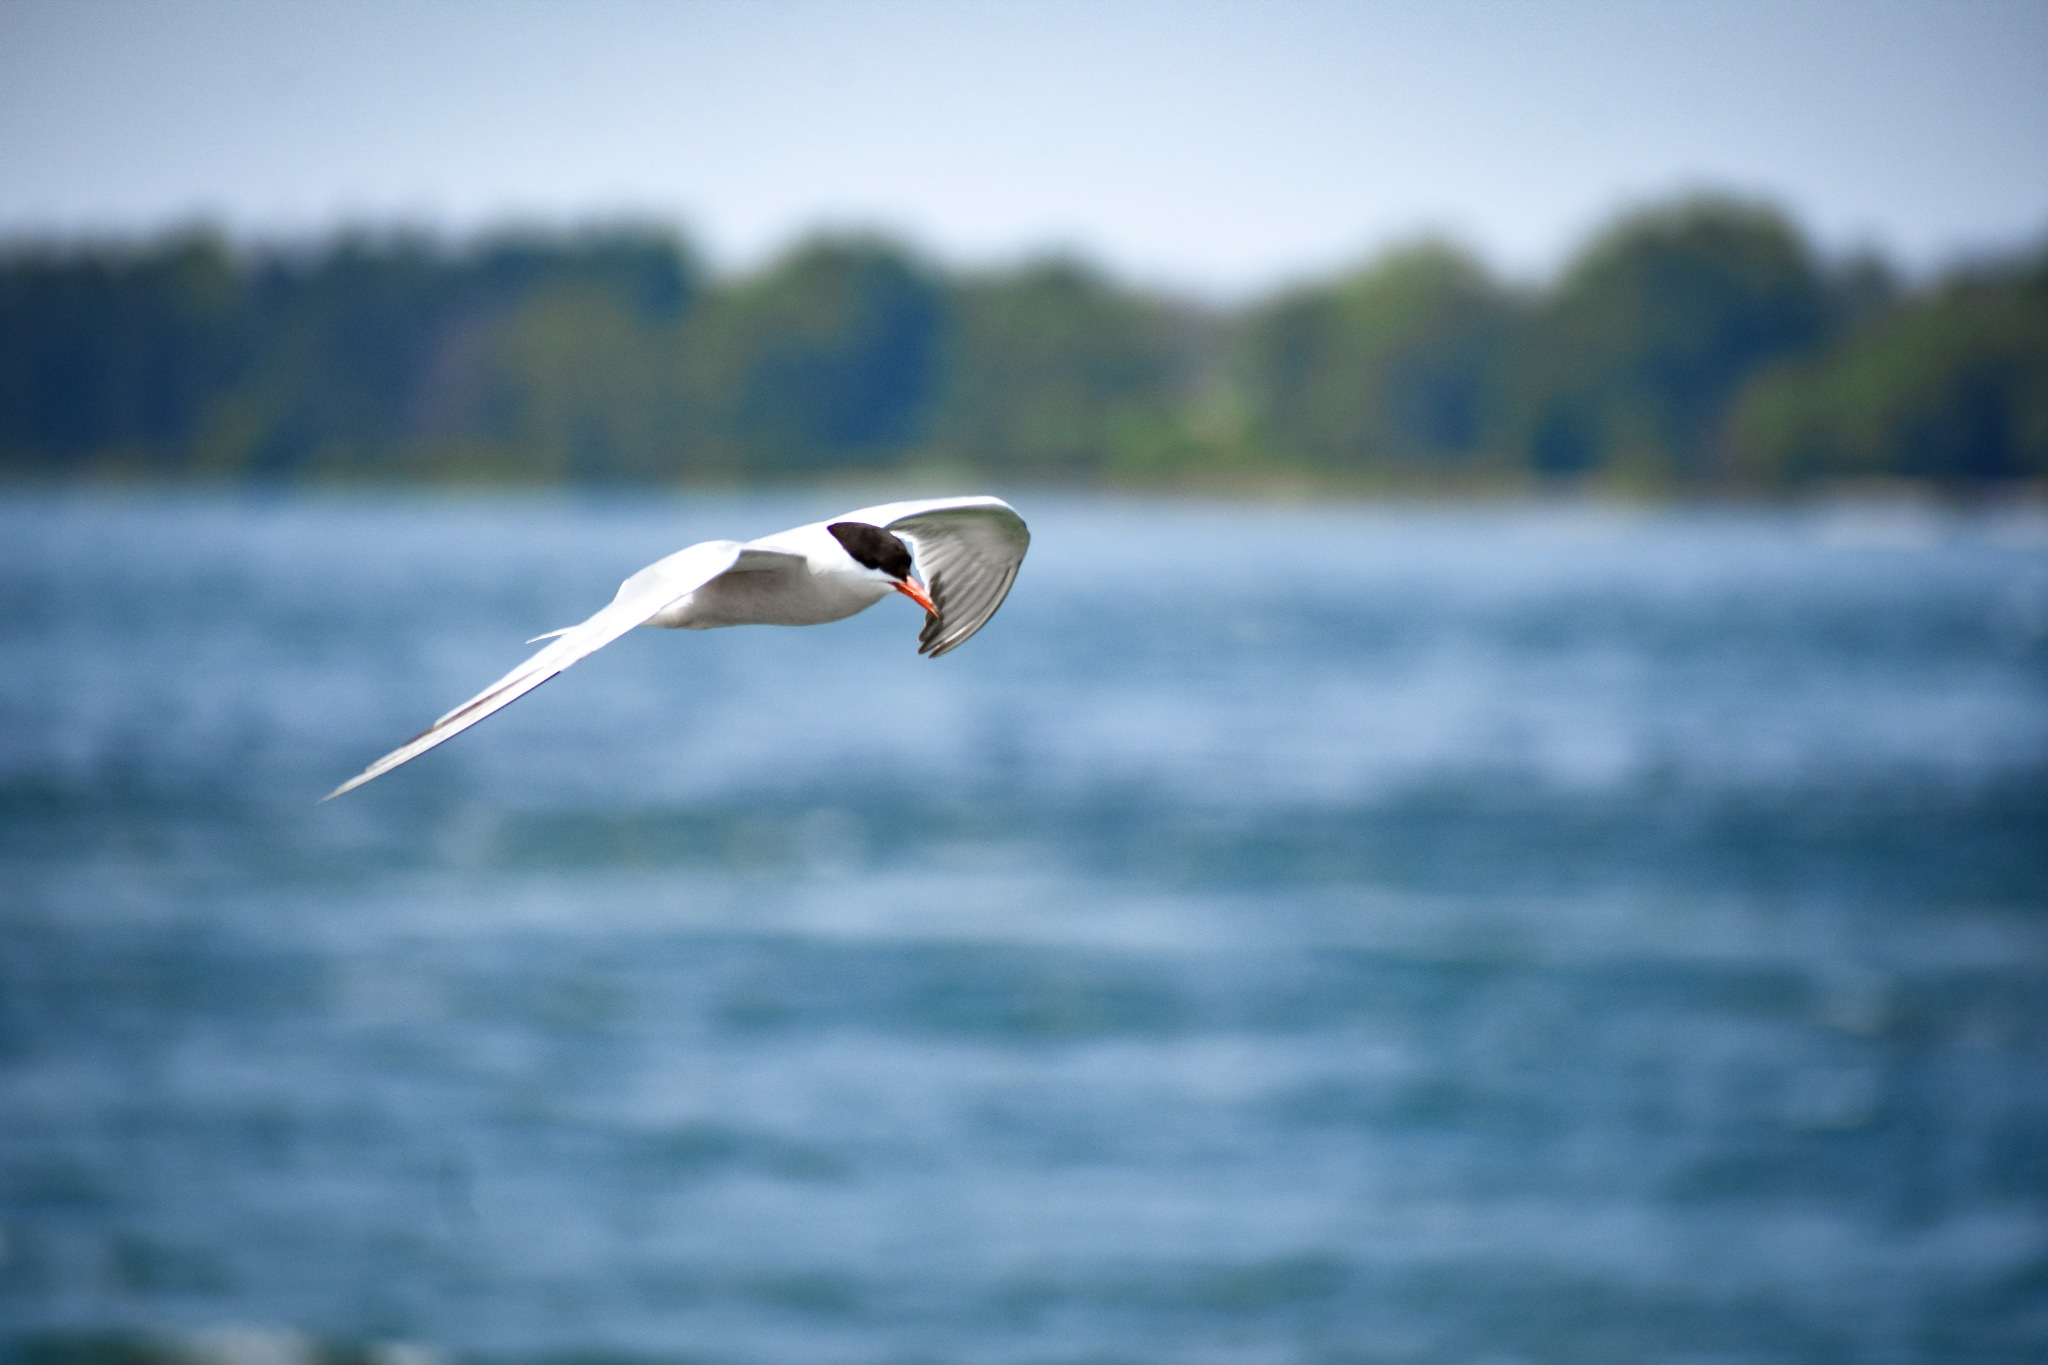 Fly Away by Brian Dobrick